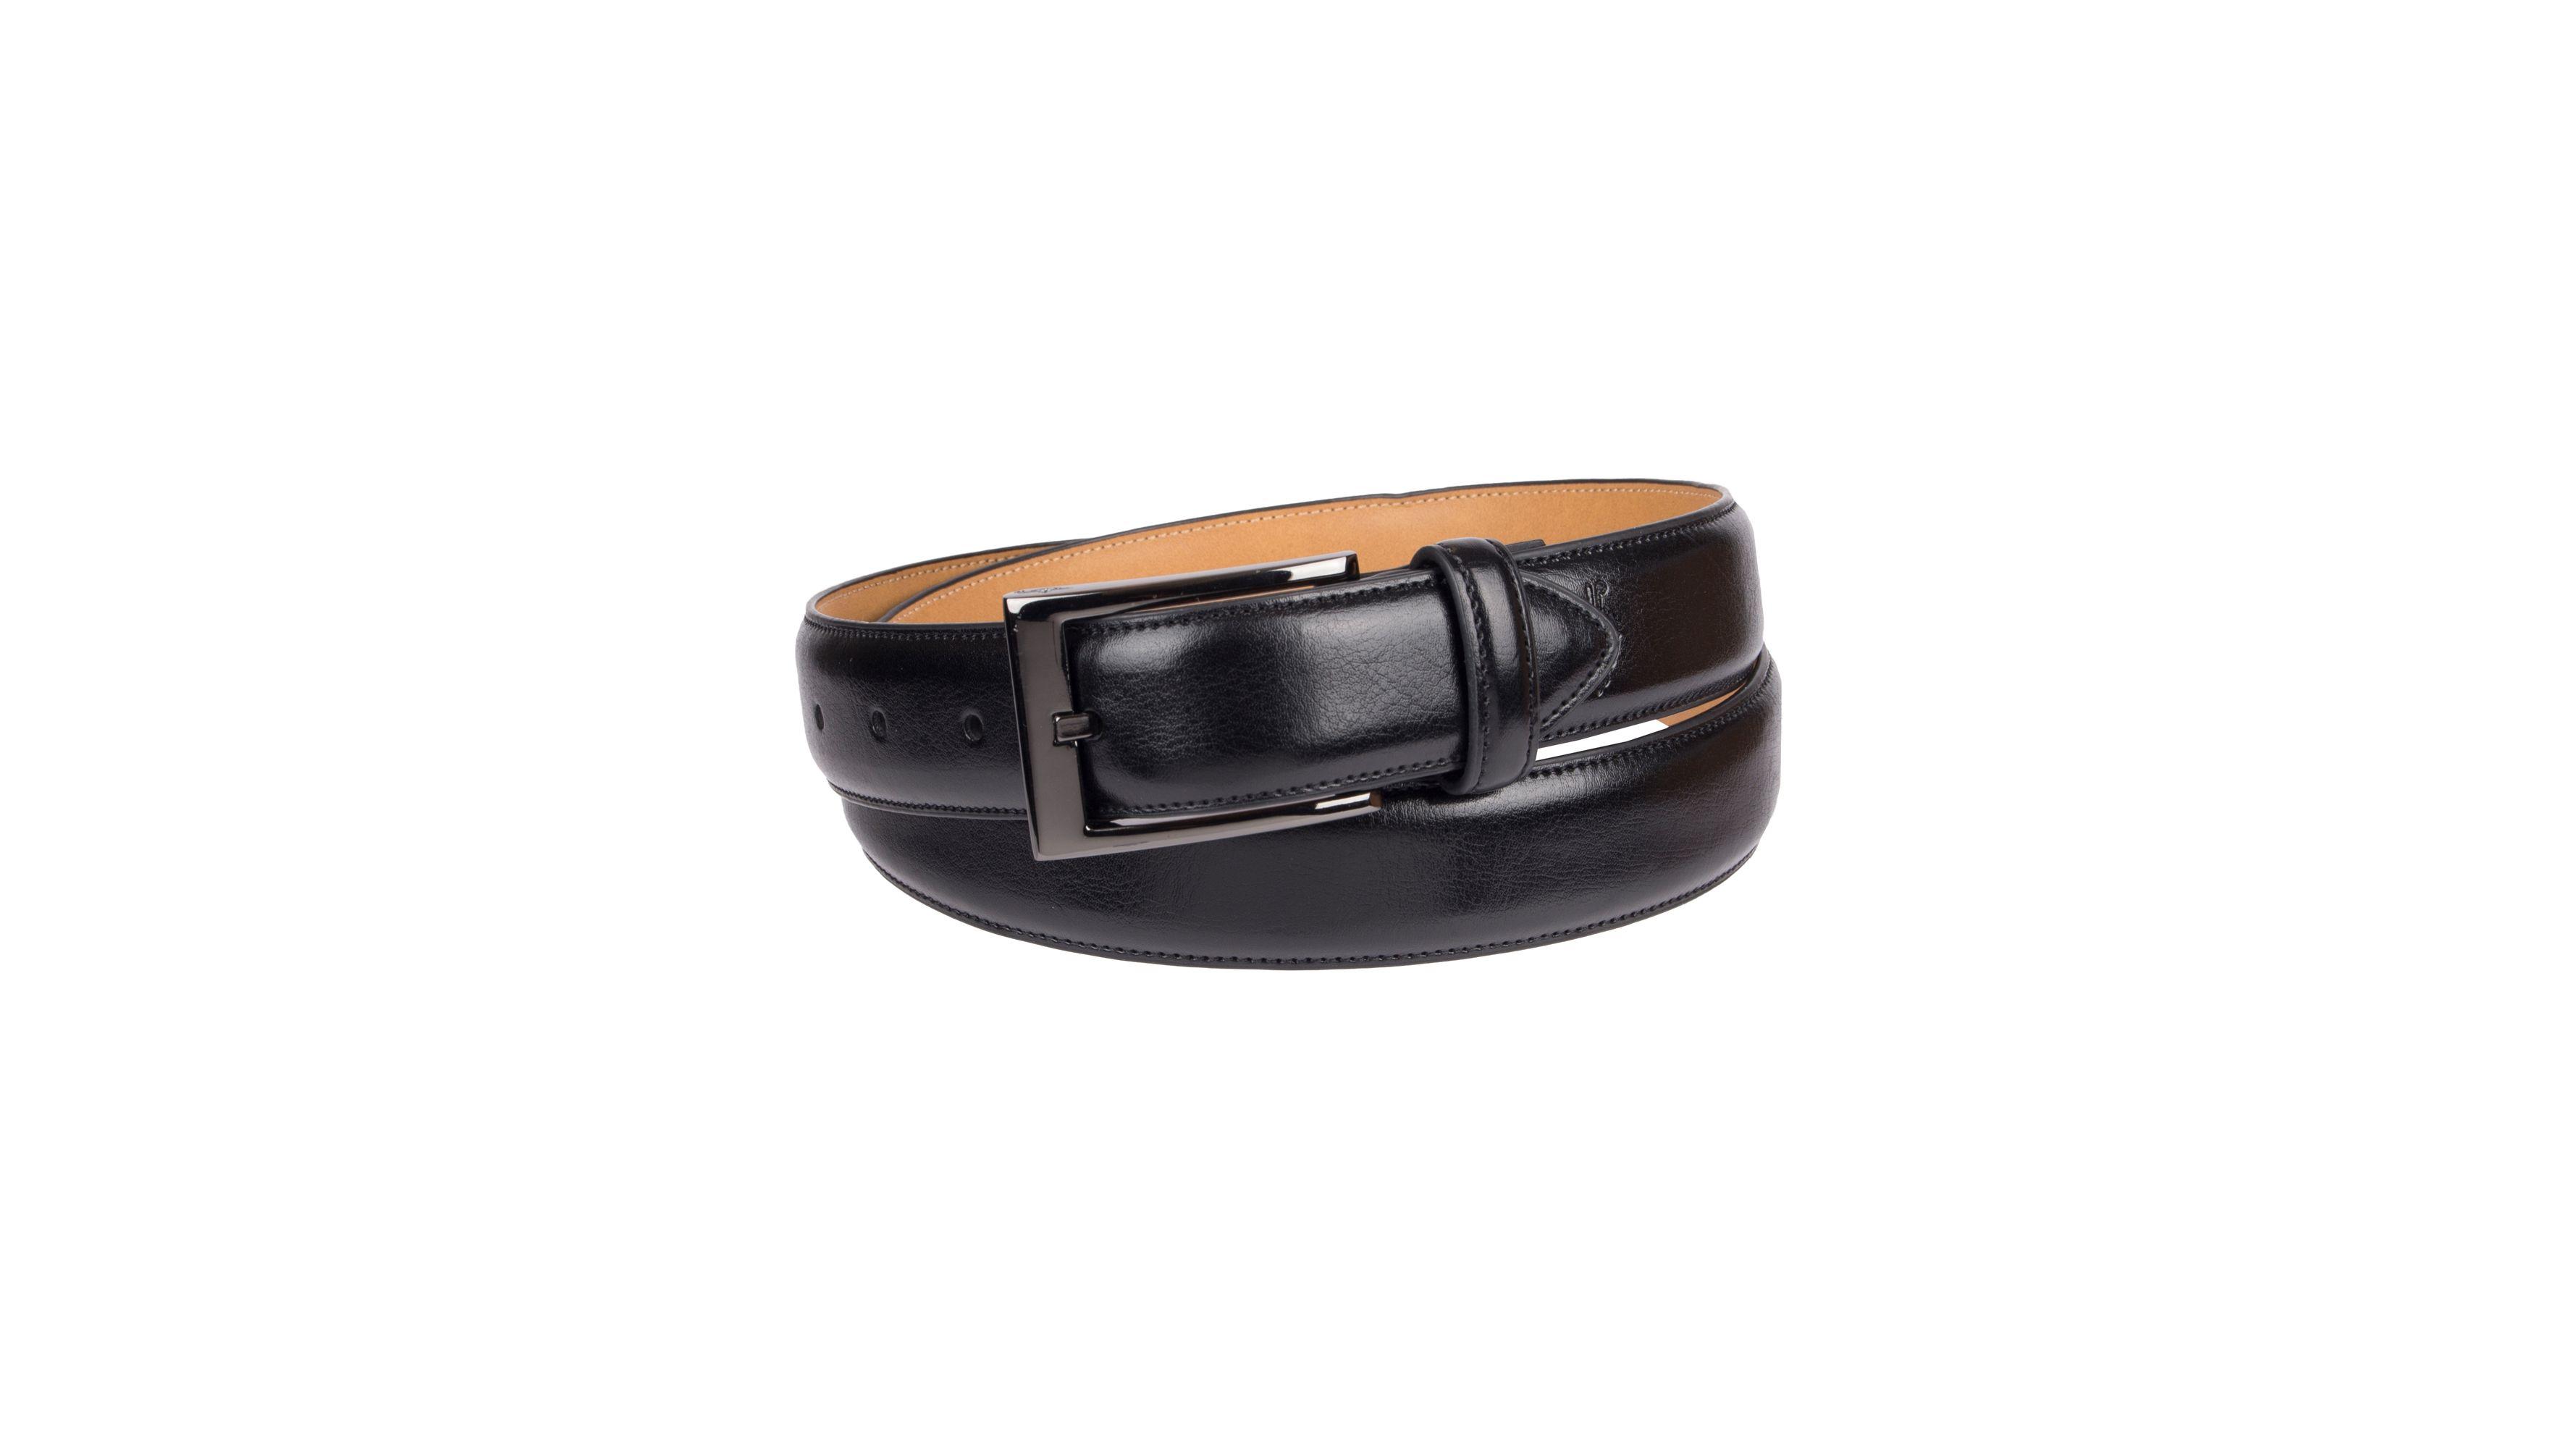 Men/'s Black Belt Bonded Leather Size XXXL 50-52 Dress Fashion Belt Italy Style